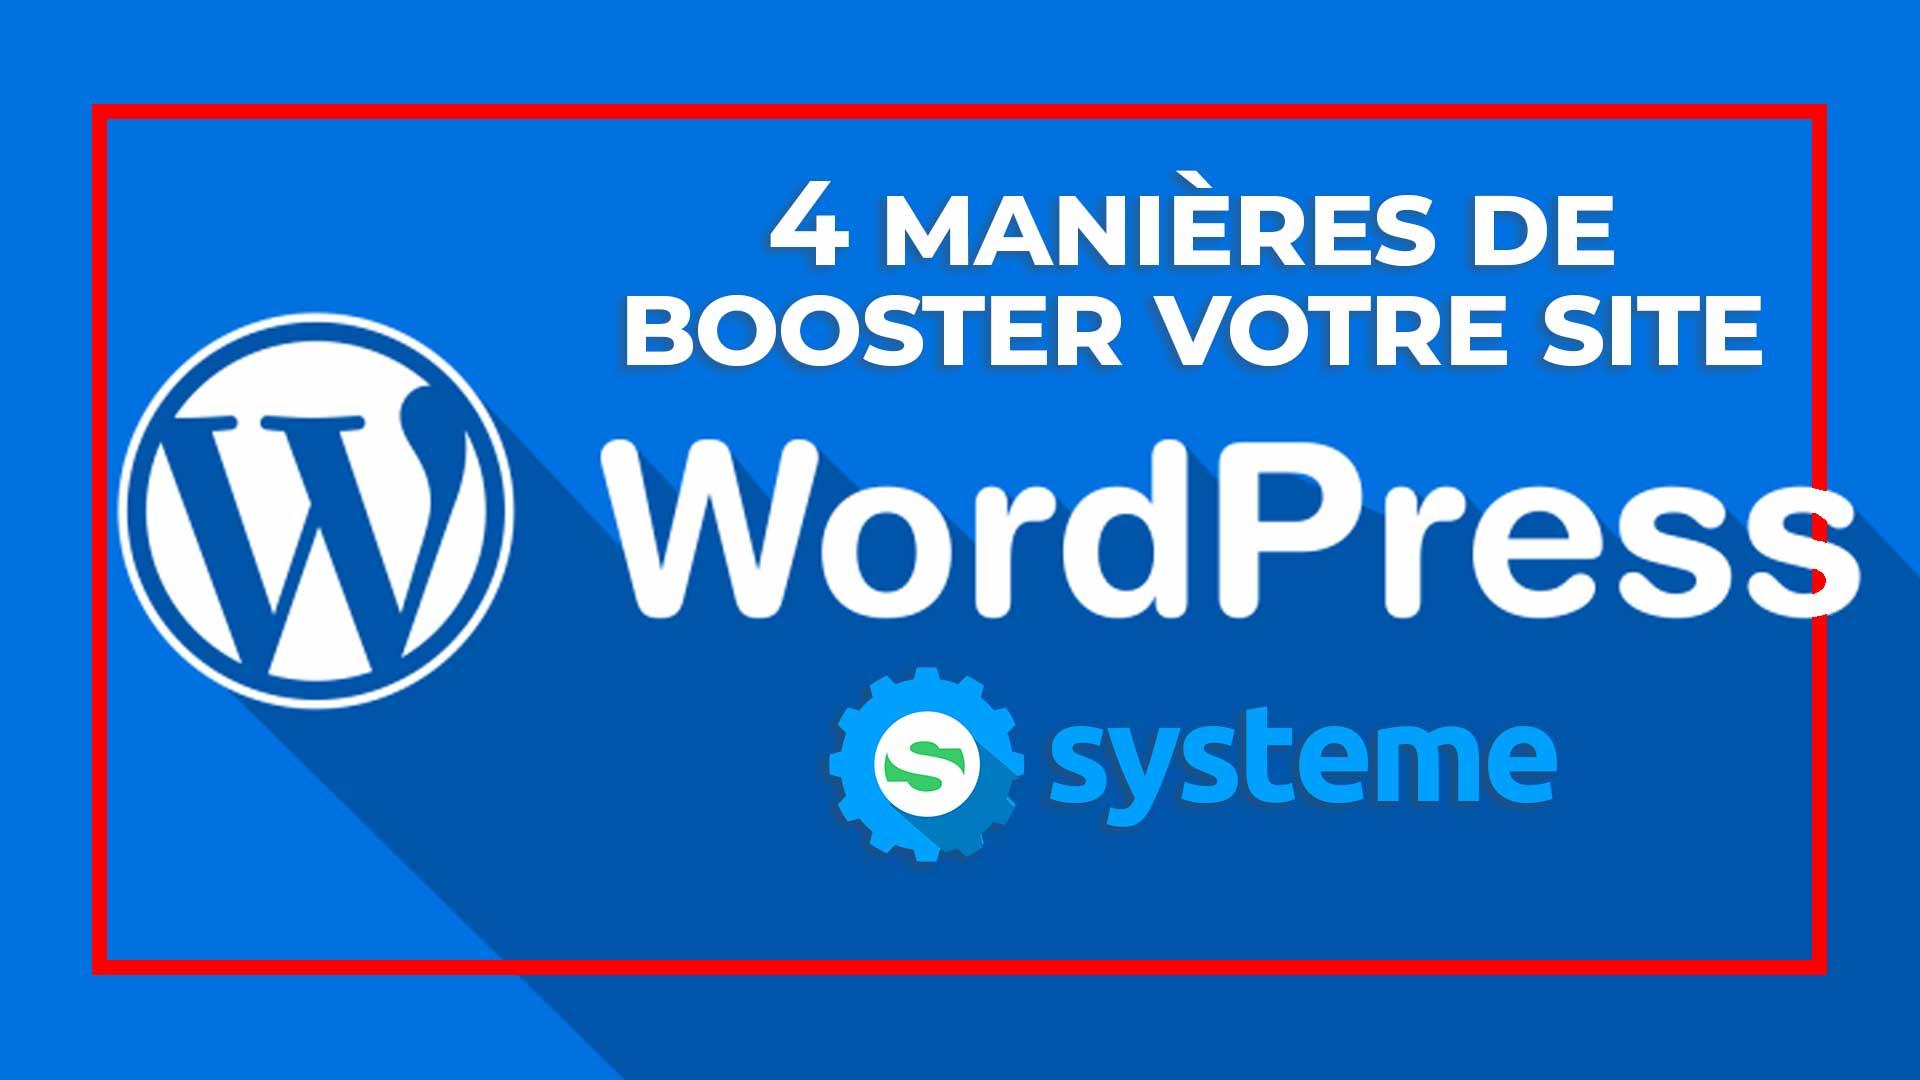 4-manière-de-bosster-son-site-word-press-systeme-io